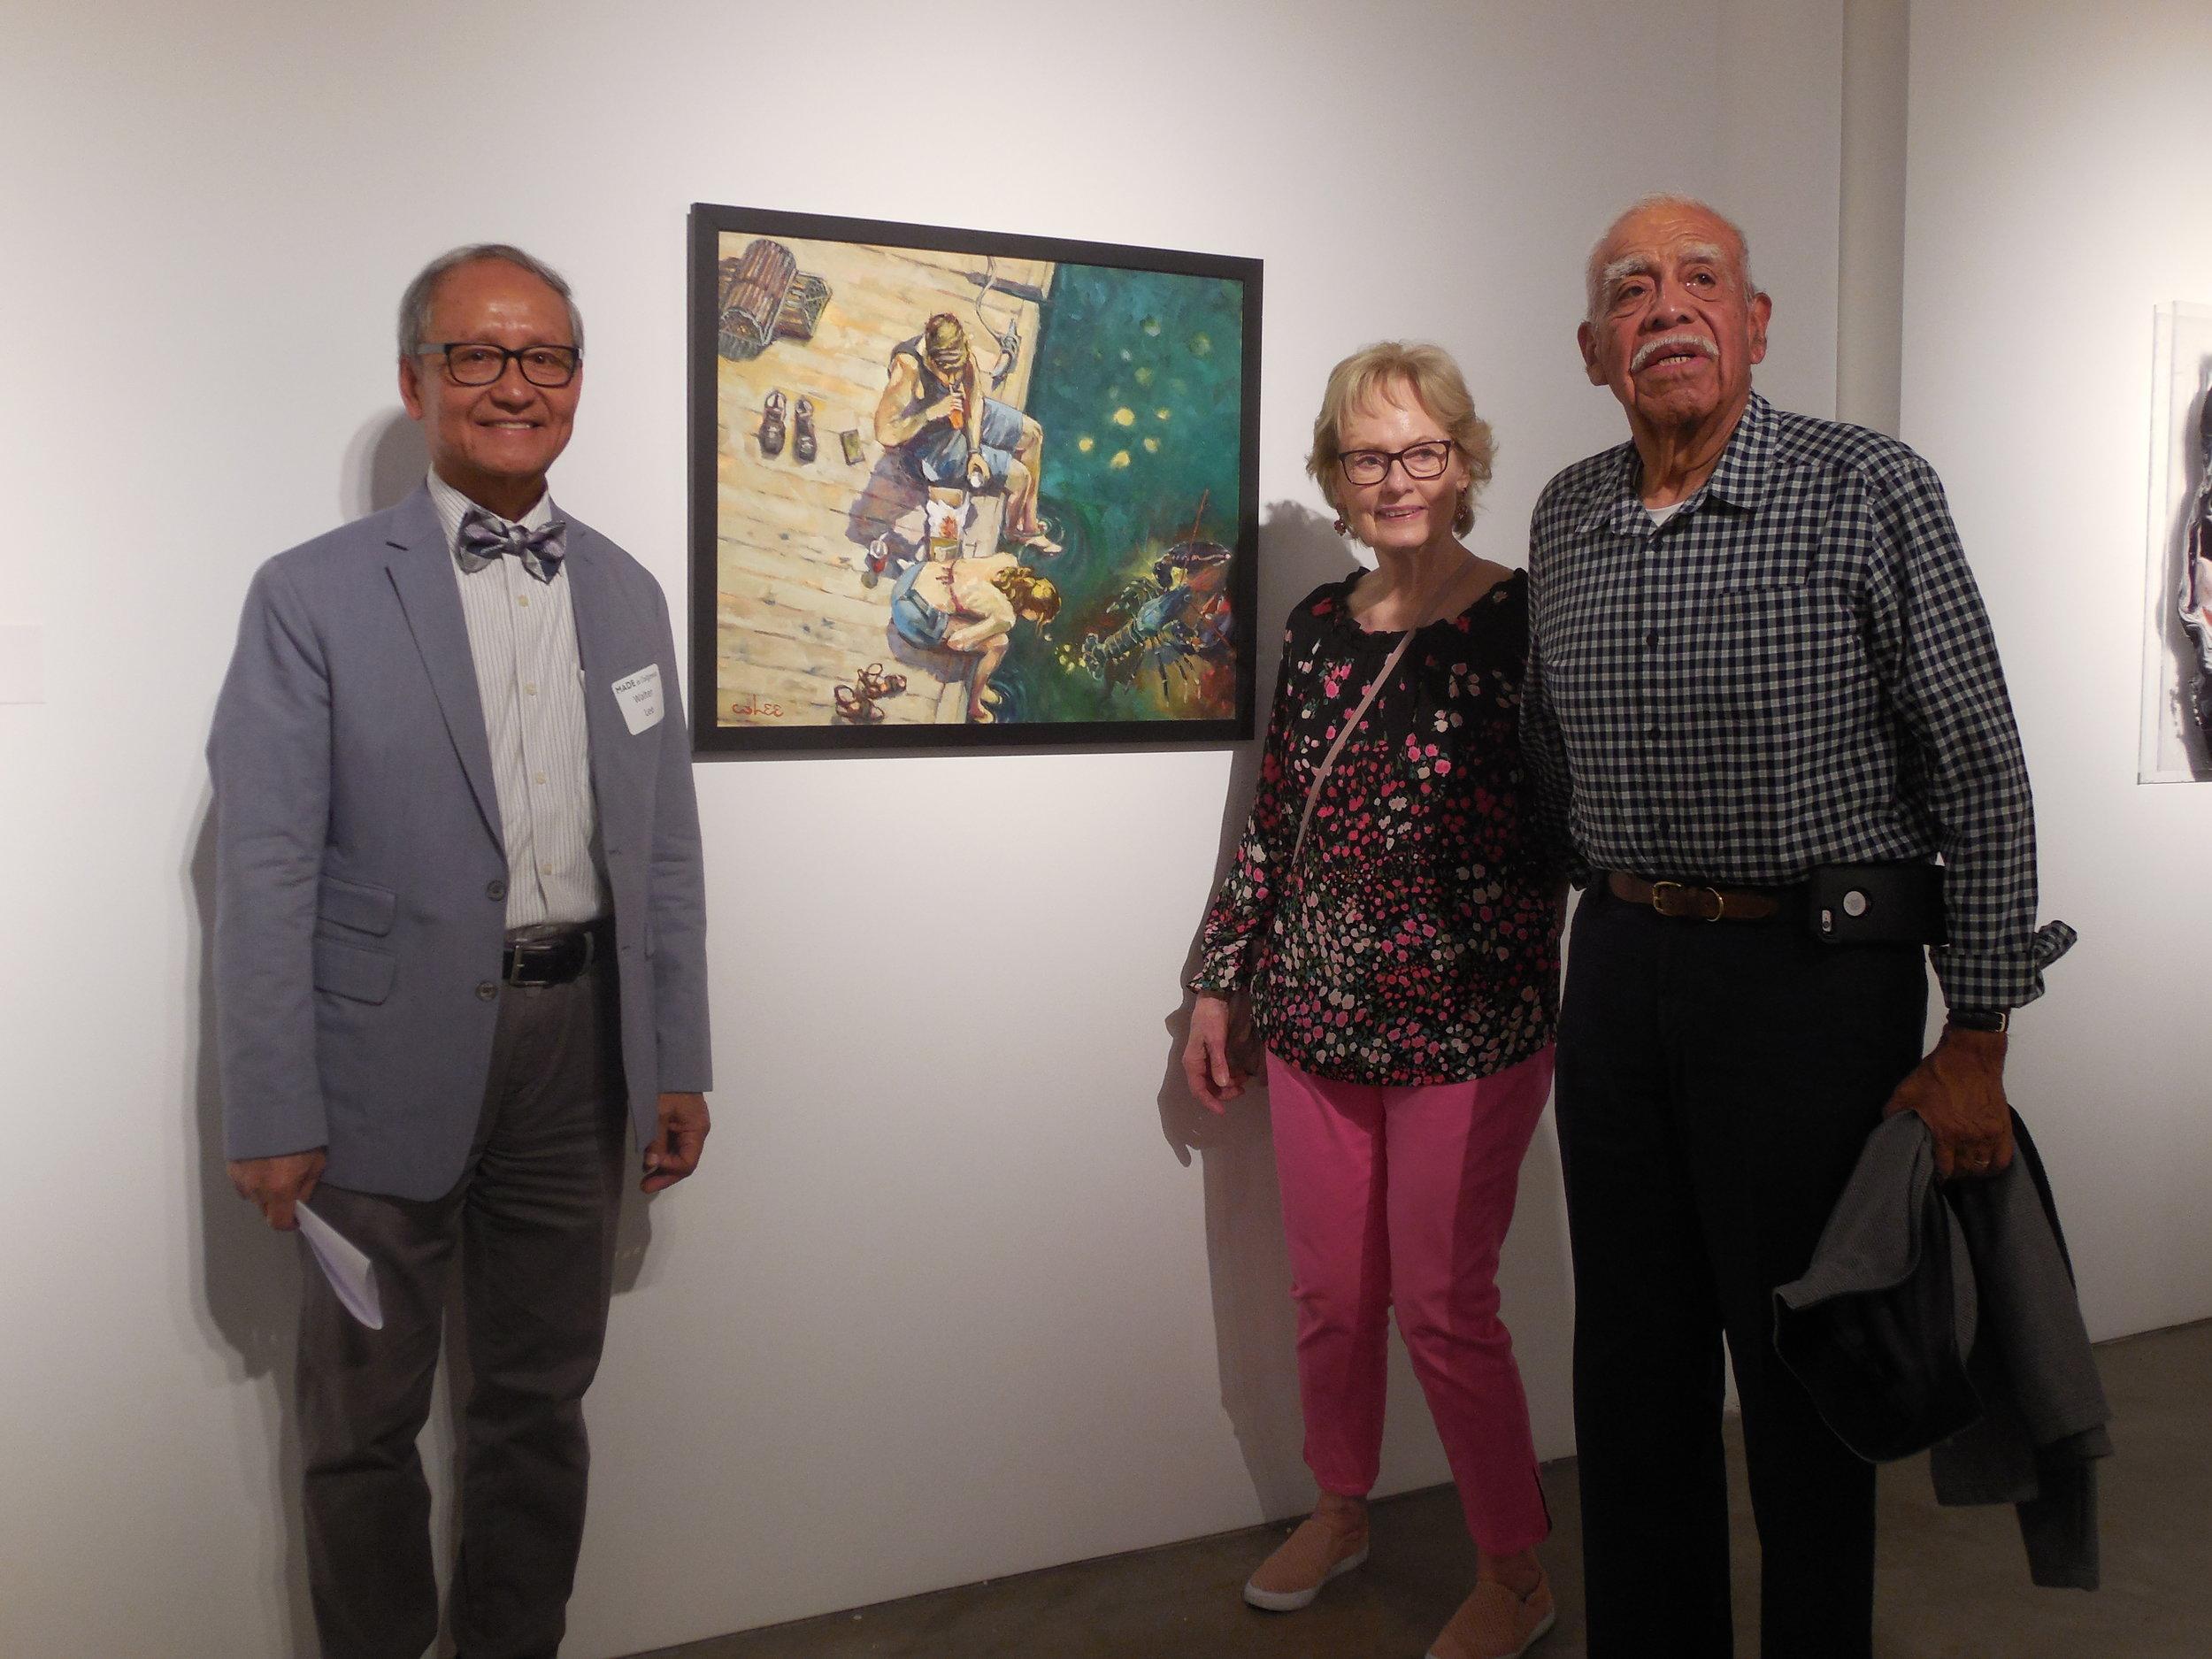 With Jan Ortega(PYLAA Secretary) and Manny Ortega.